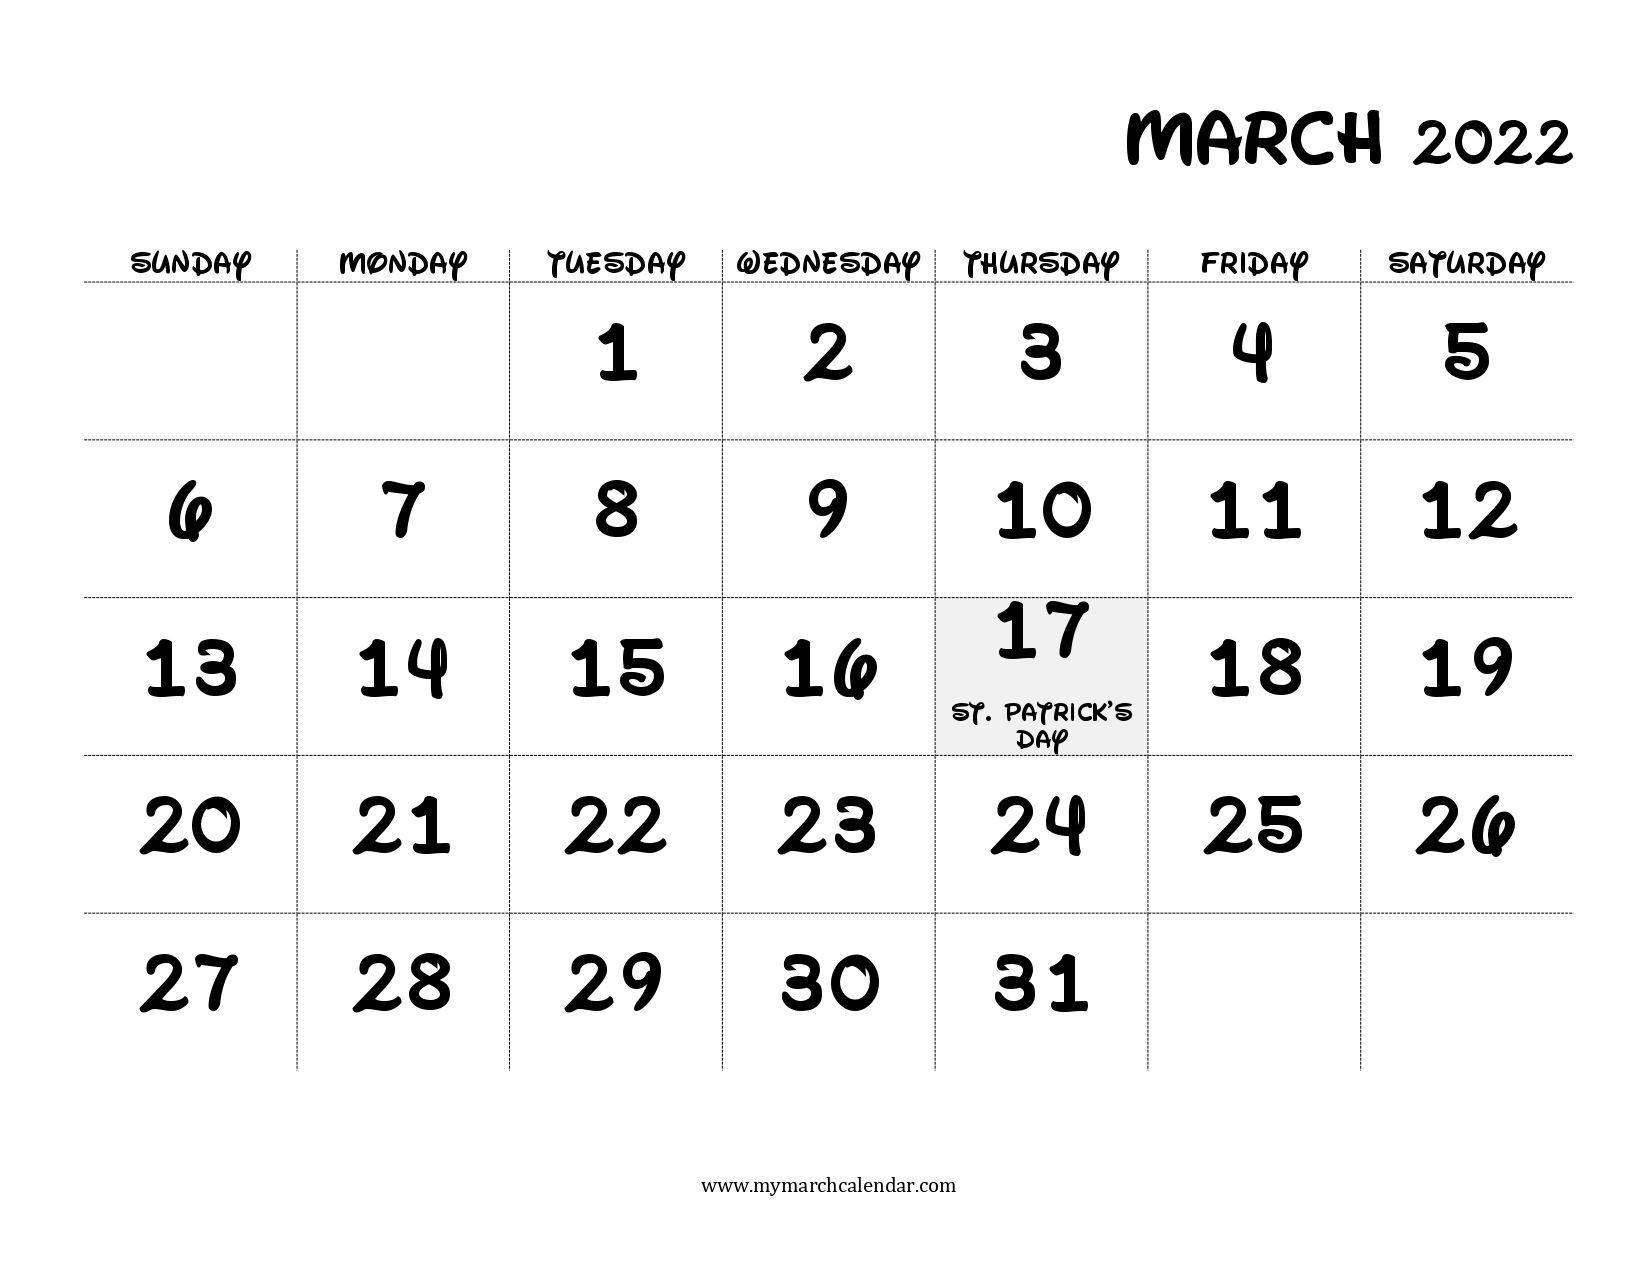 30+ March 2022 Calendar, March 2022 Blank Calendar